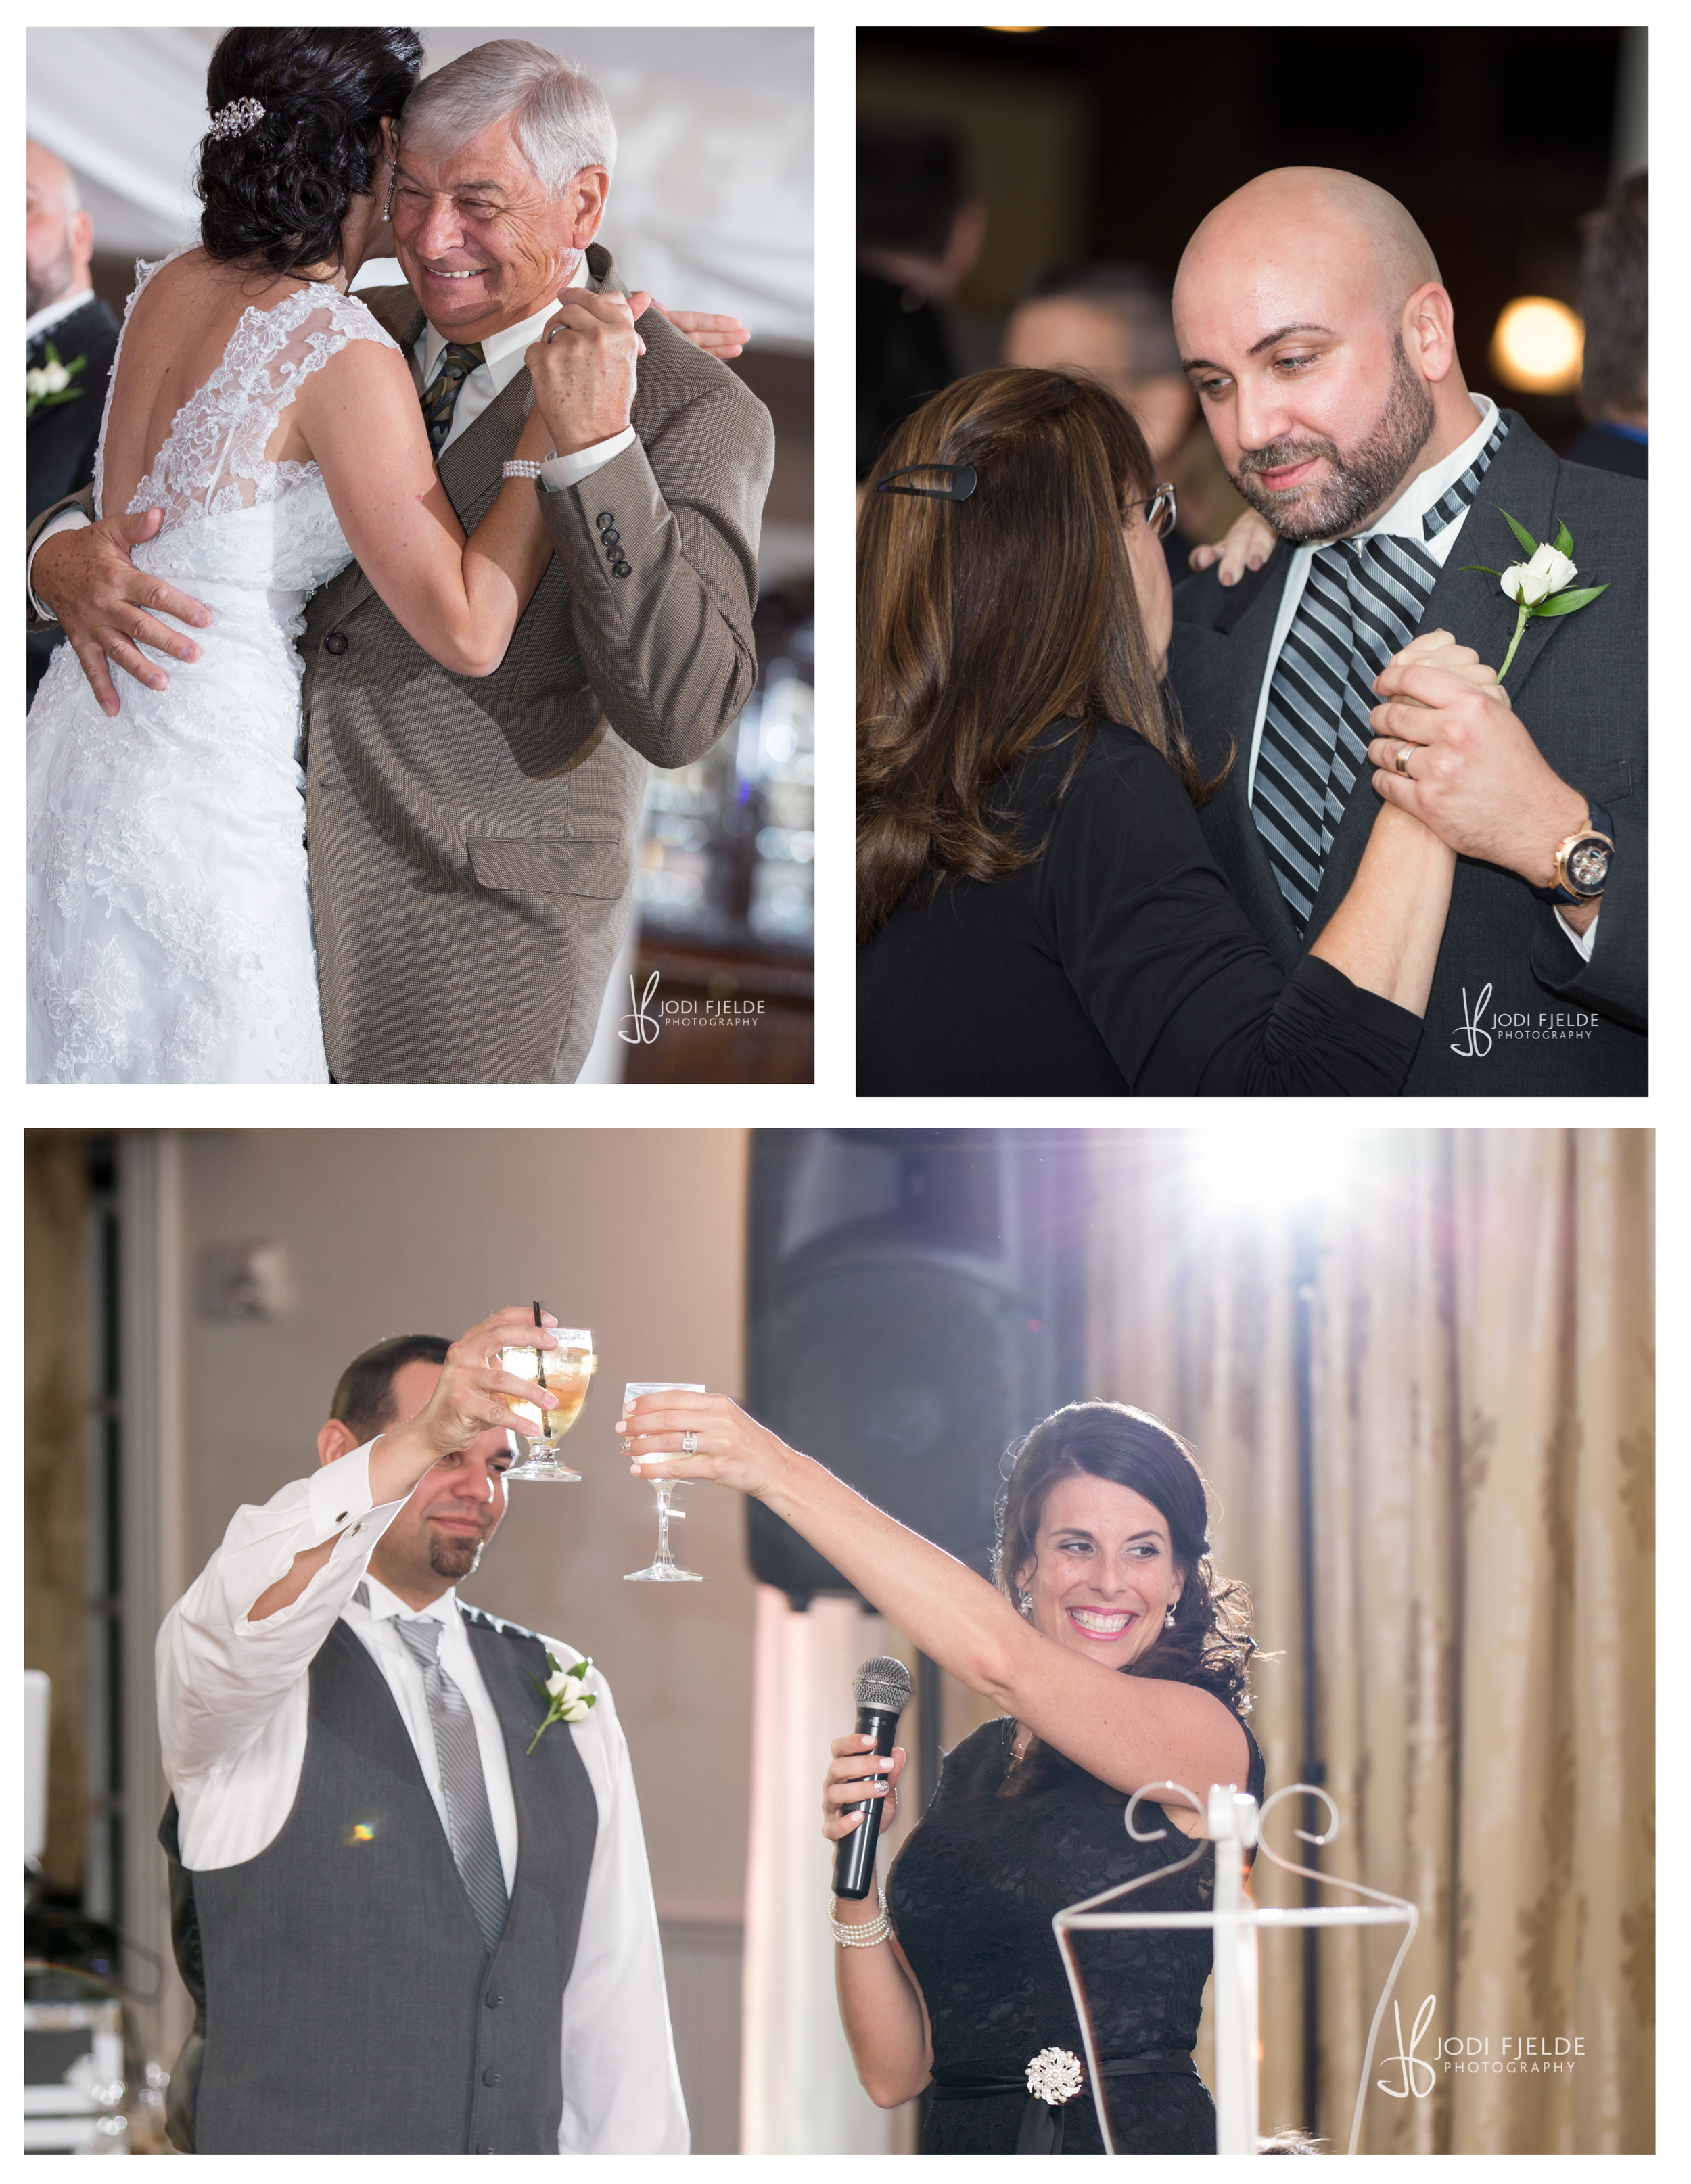 Highland_Manor_Apopka_Florida_wedding_Jackie_&_Tim_photography_jodi_Fjelde_photography-29.jpg